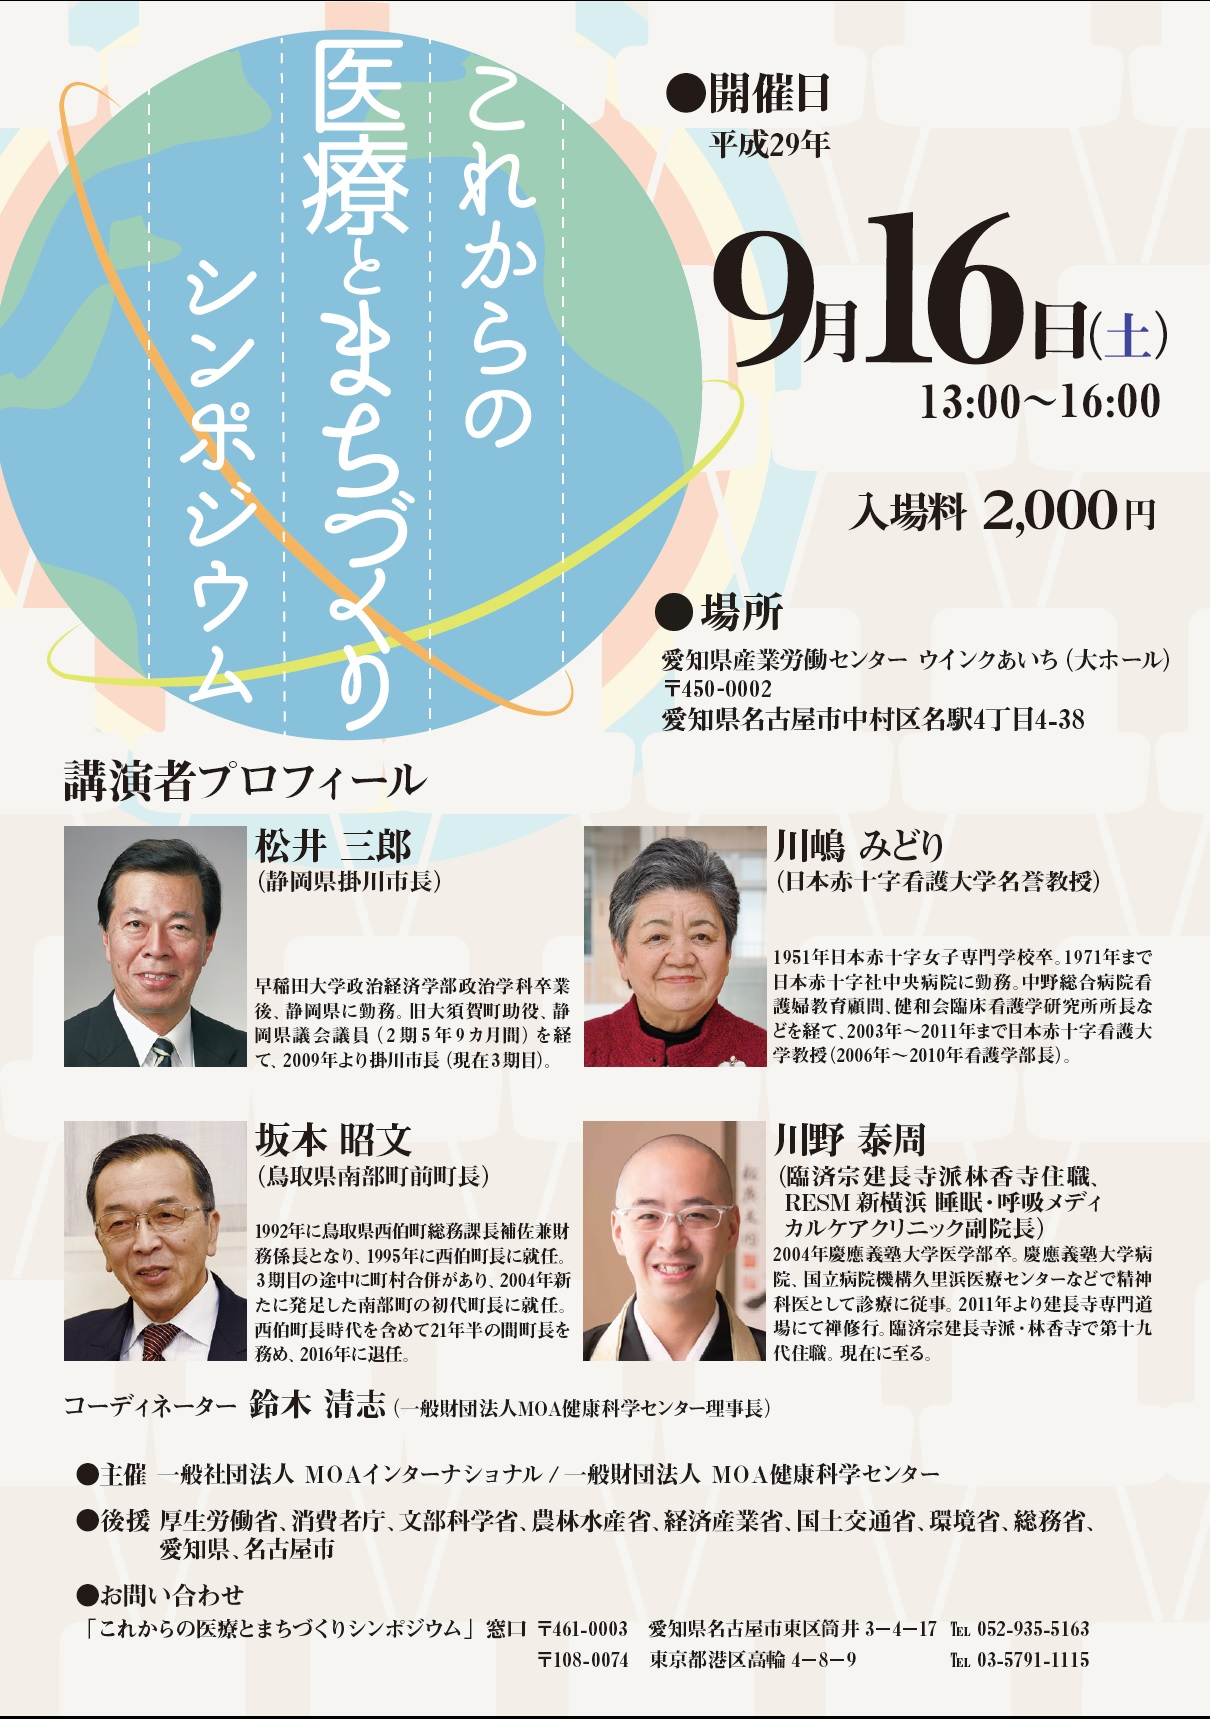 http://mhs.or.jp/blog/assets_c/2017/09/シンポジウム画像-thumb-1210x1719.jpg